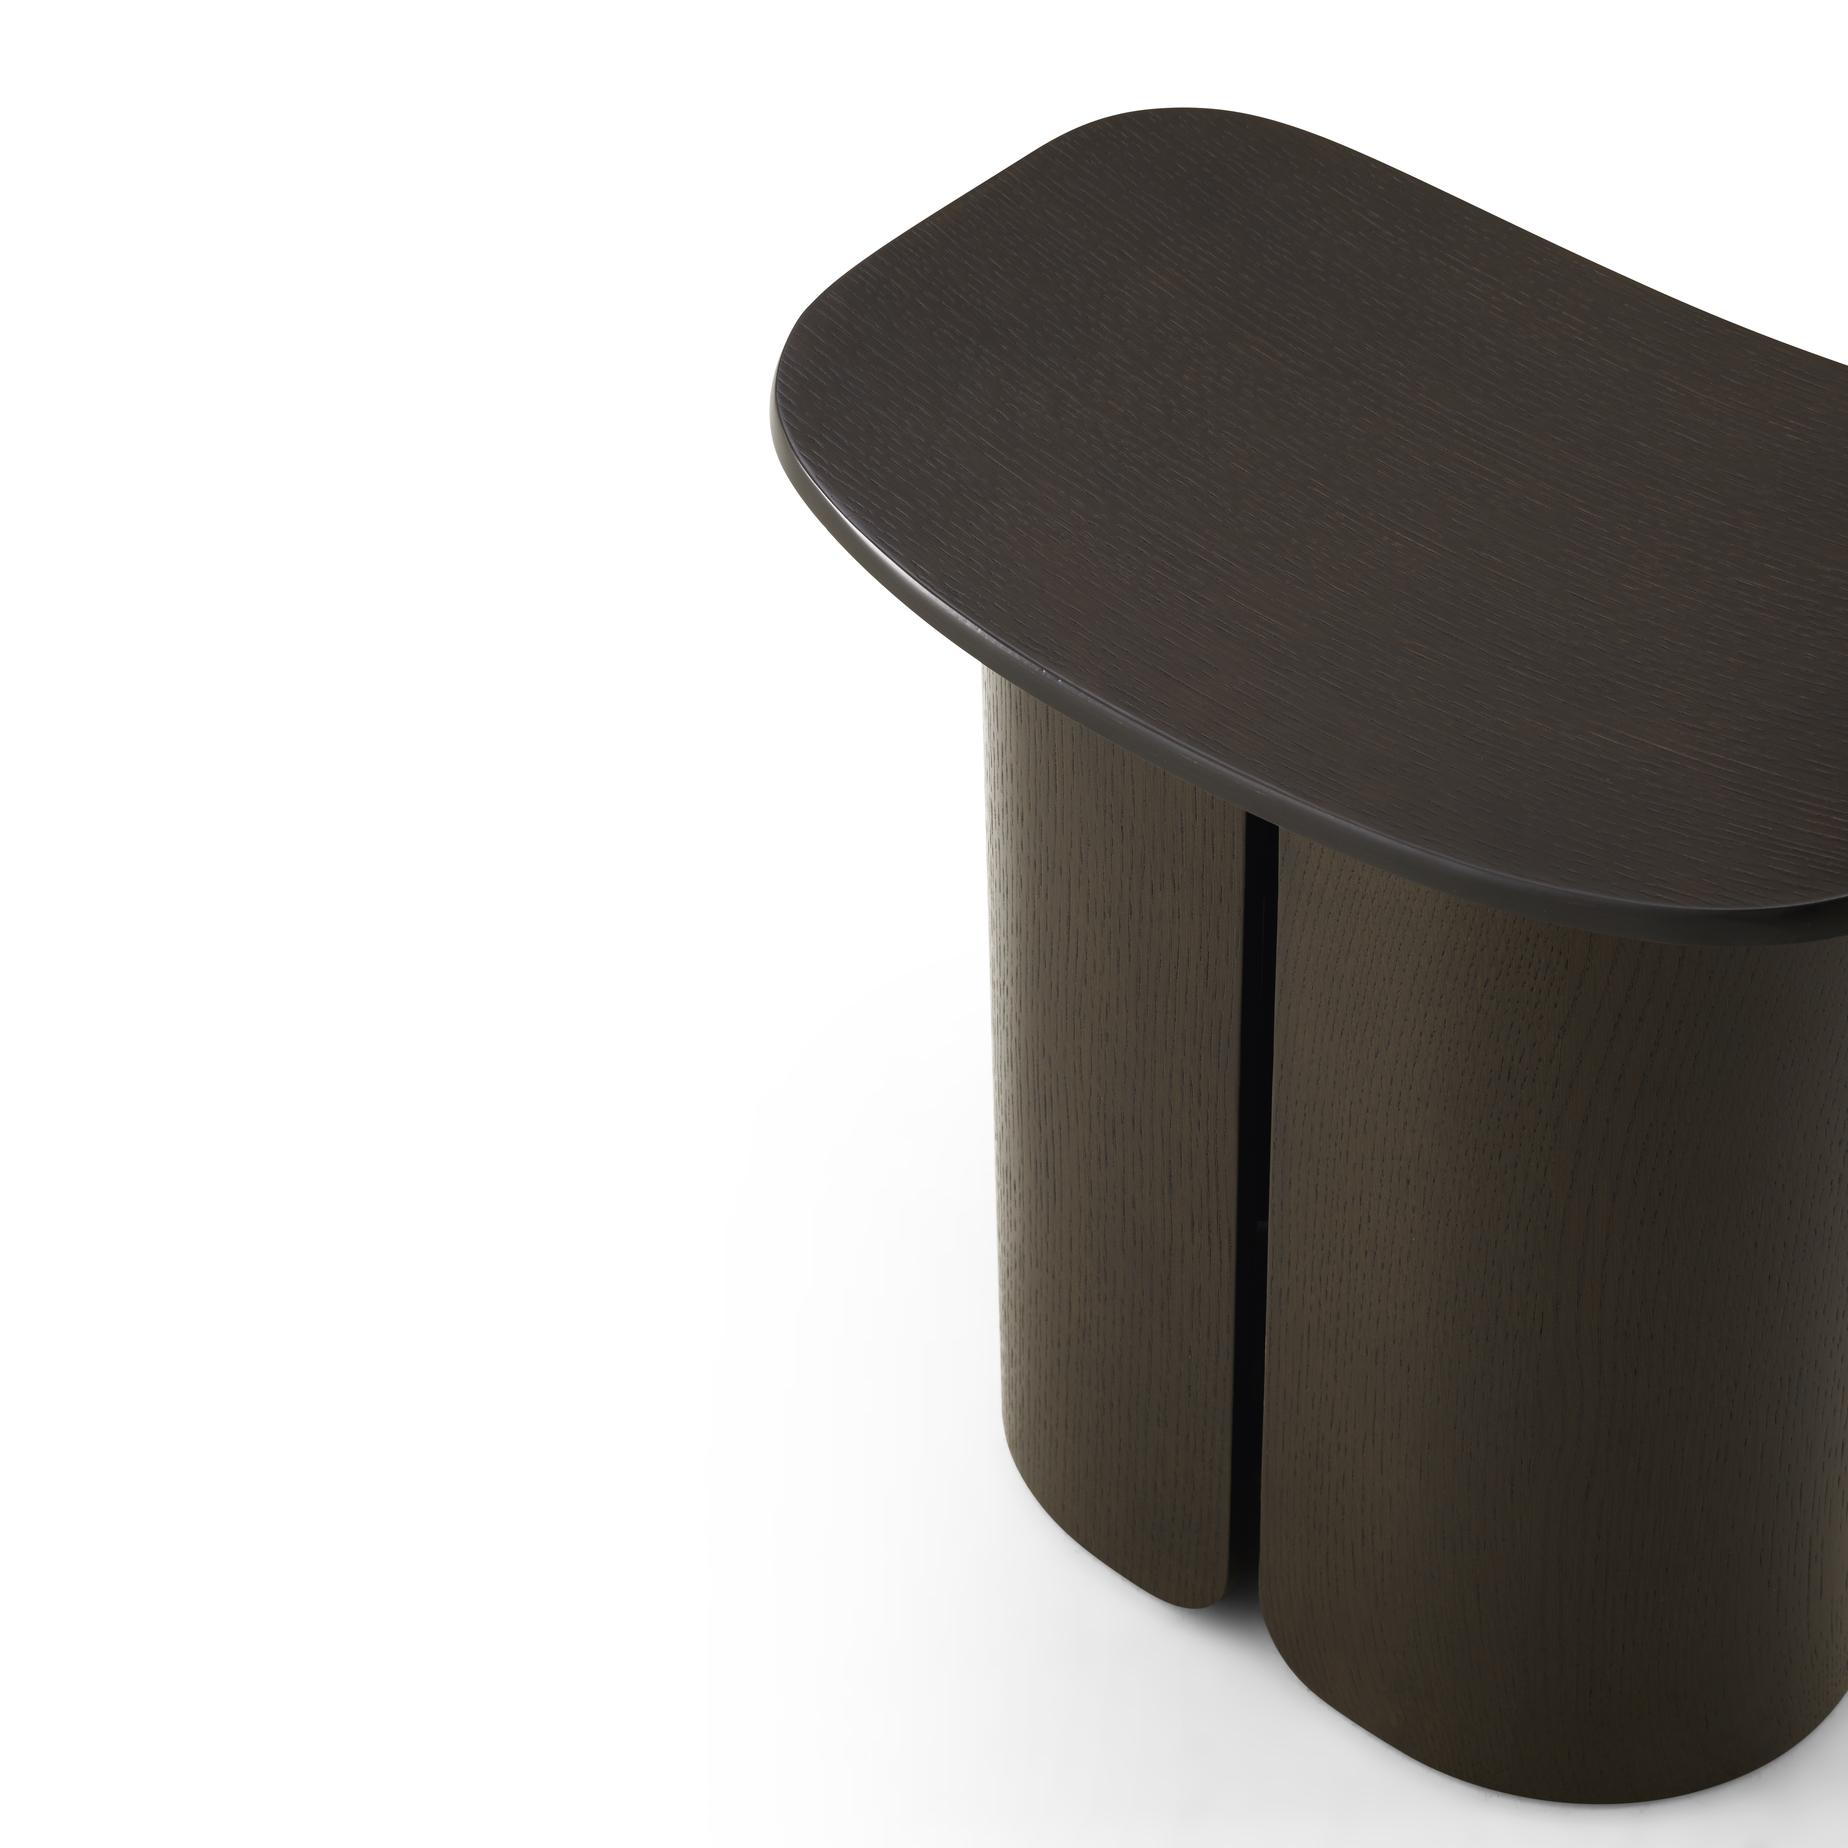 Mobilier De France Chalons En Champagne san, chairs from designer : studio klass   ligne roset